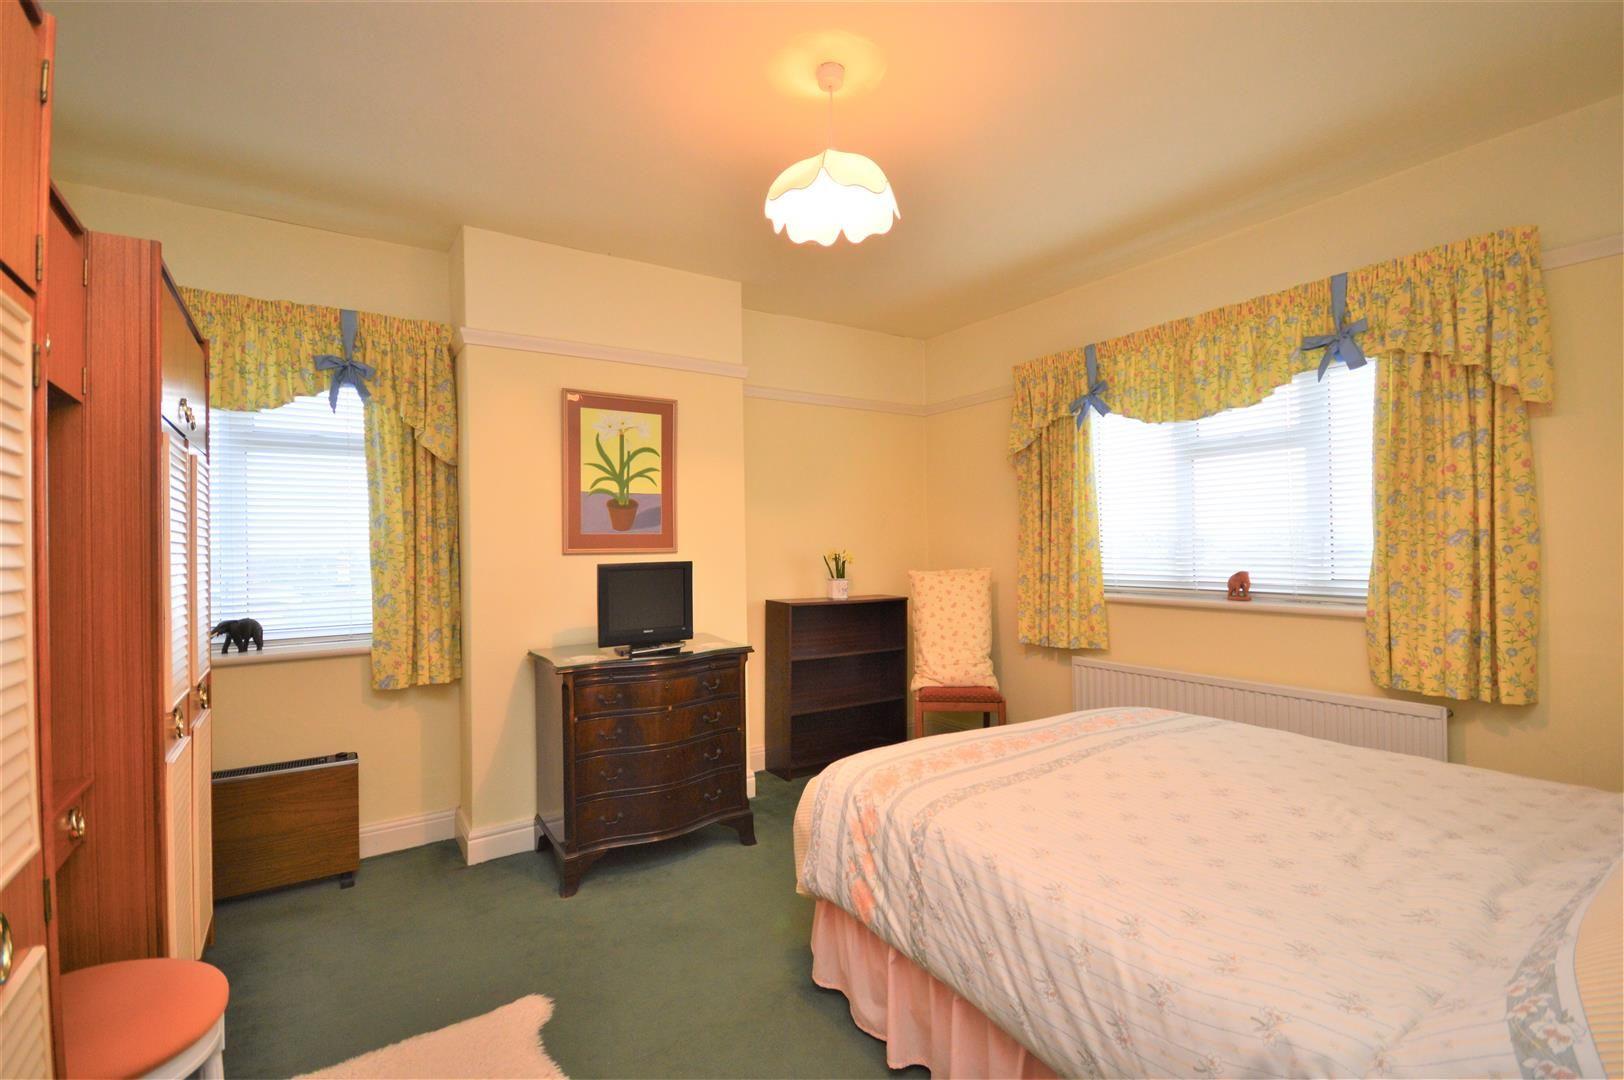 4 bed detached for sale in Bobblestock  - Property Image 14